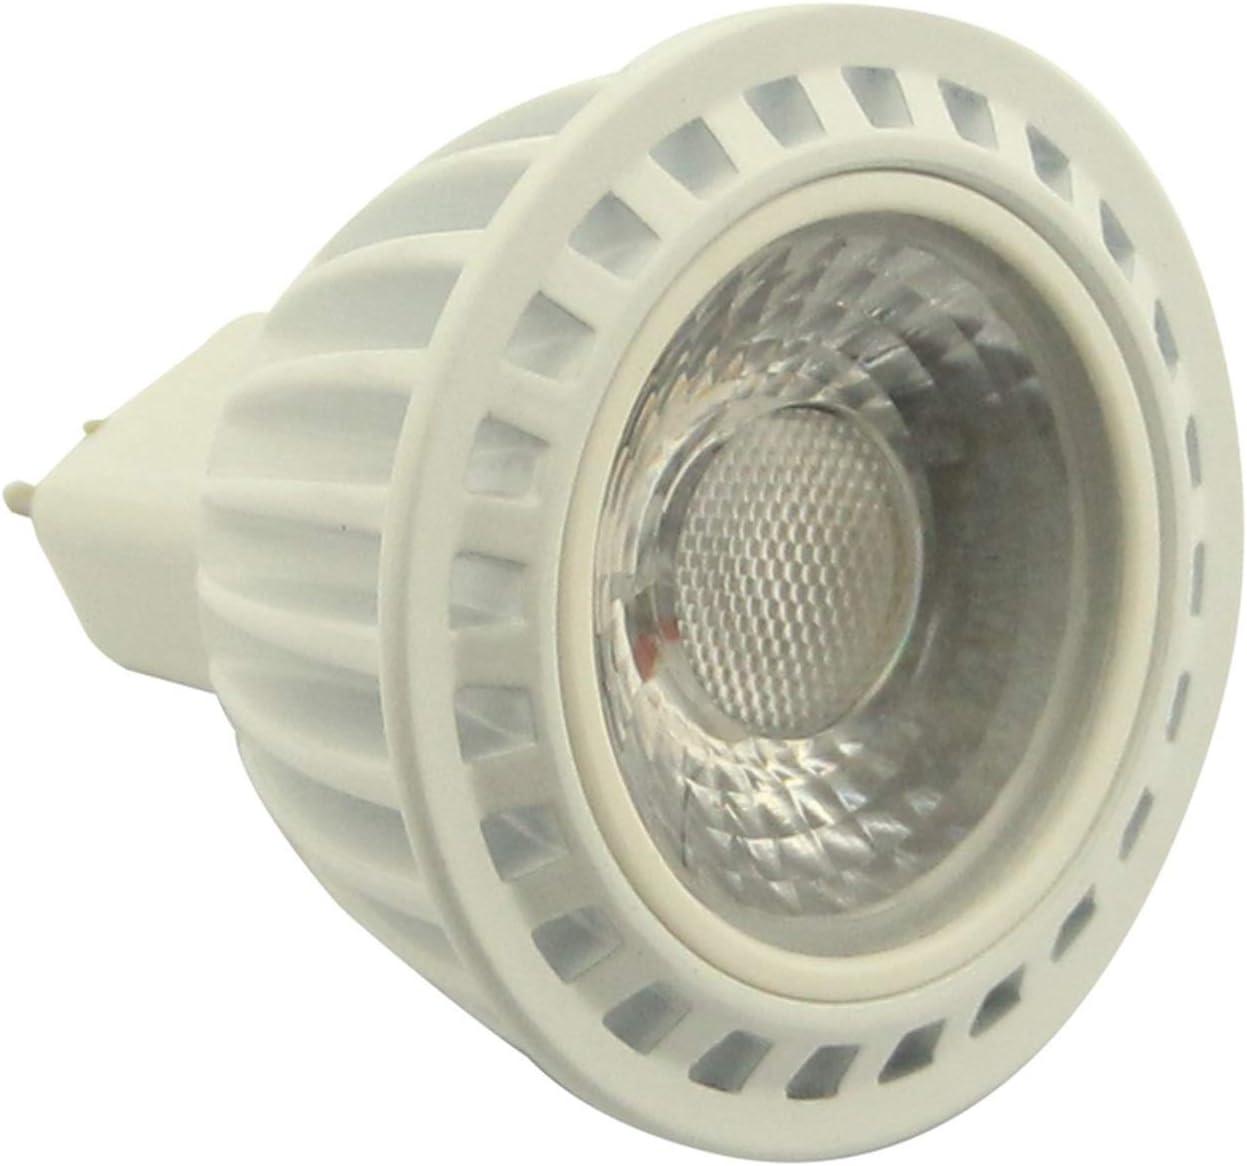 5W 24V Energy Star 50W Equivalent Welsun MR16 GU5.3 LED Light Bulb 24V Color : Cool White 6-Pack 450lm